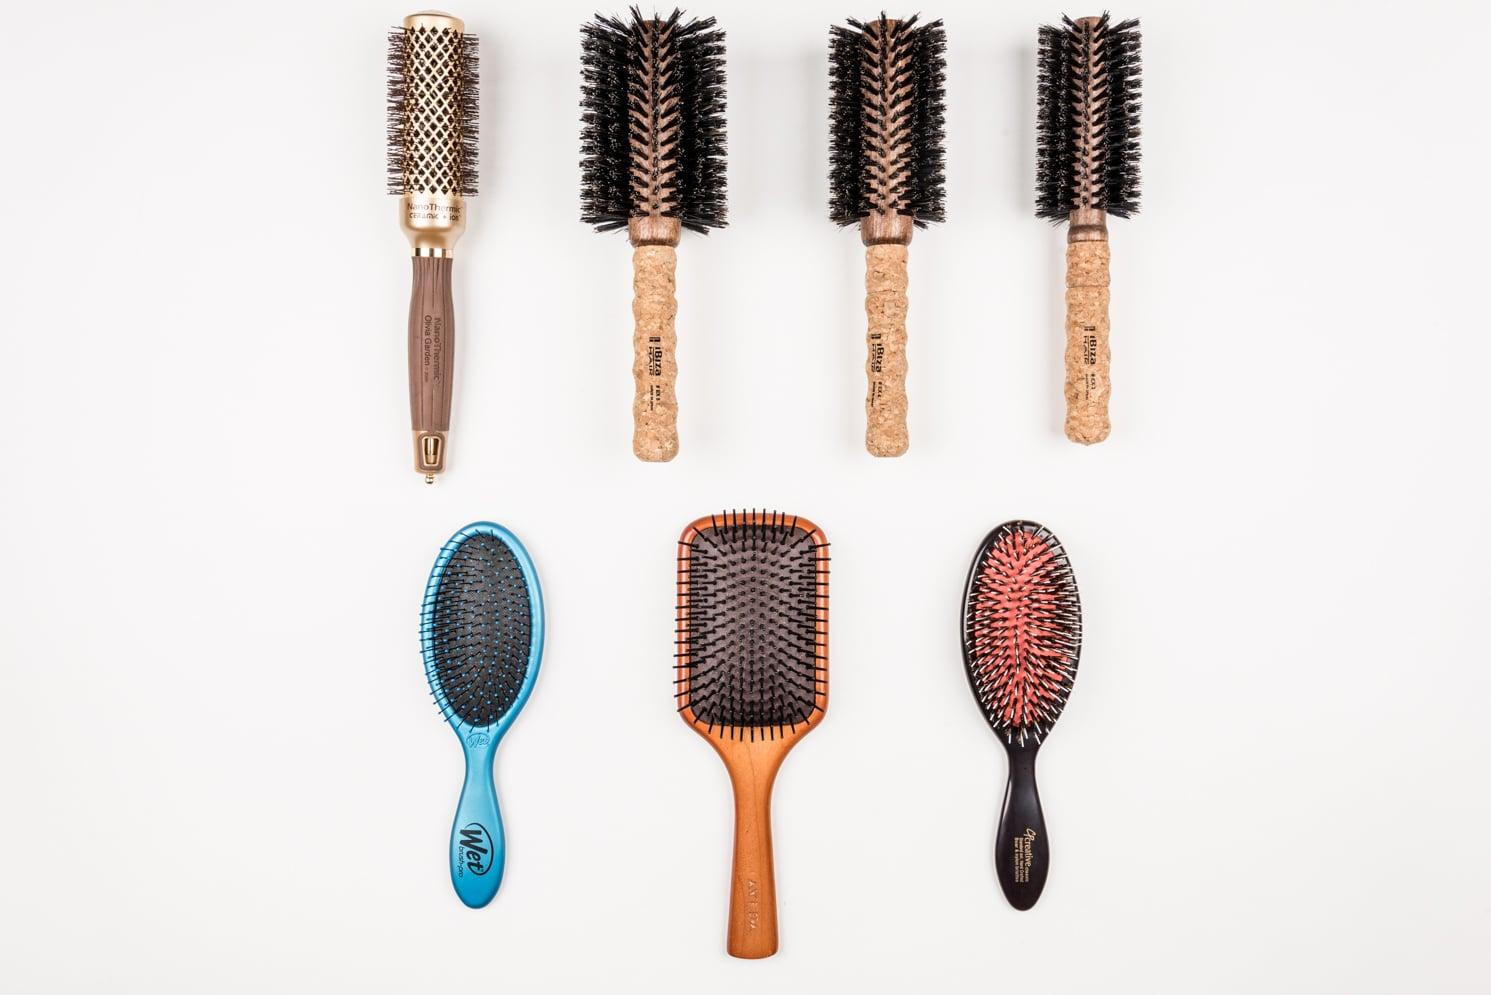 rock mama nyc lifestyle blog - how to pick the right brush - round brush